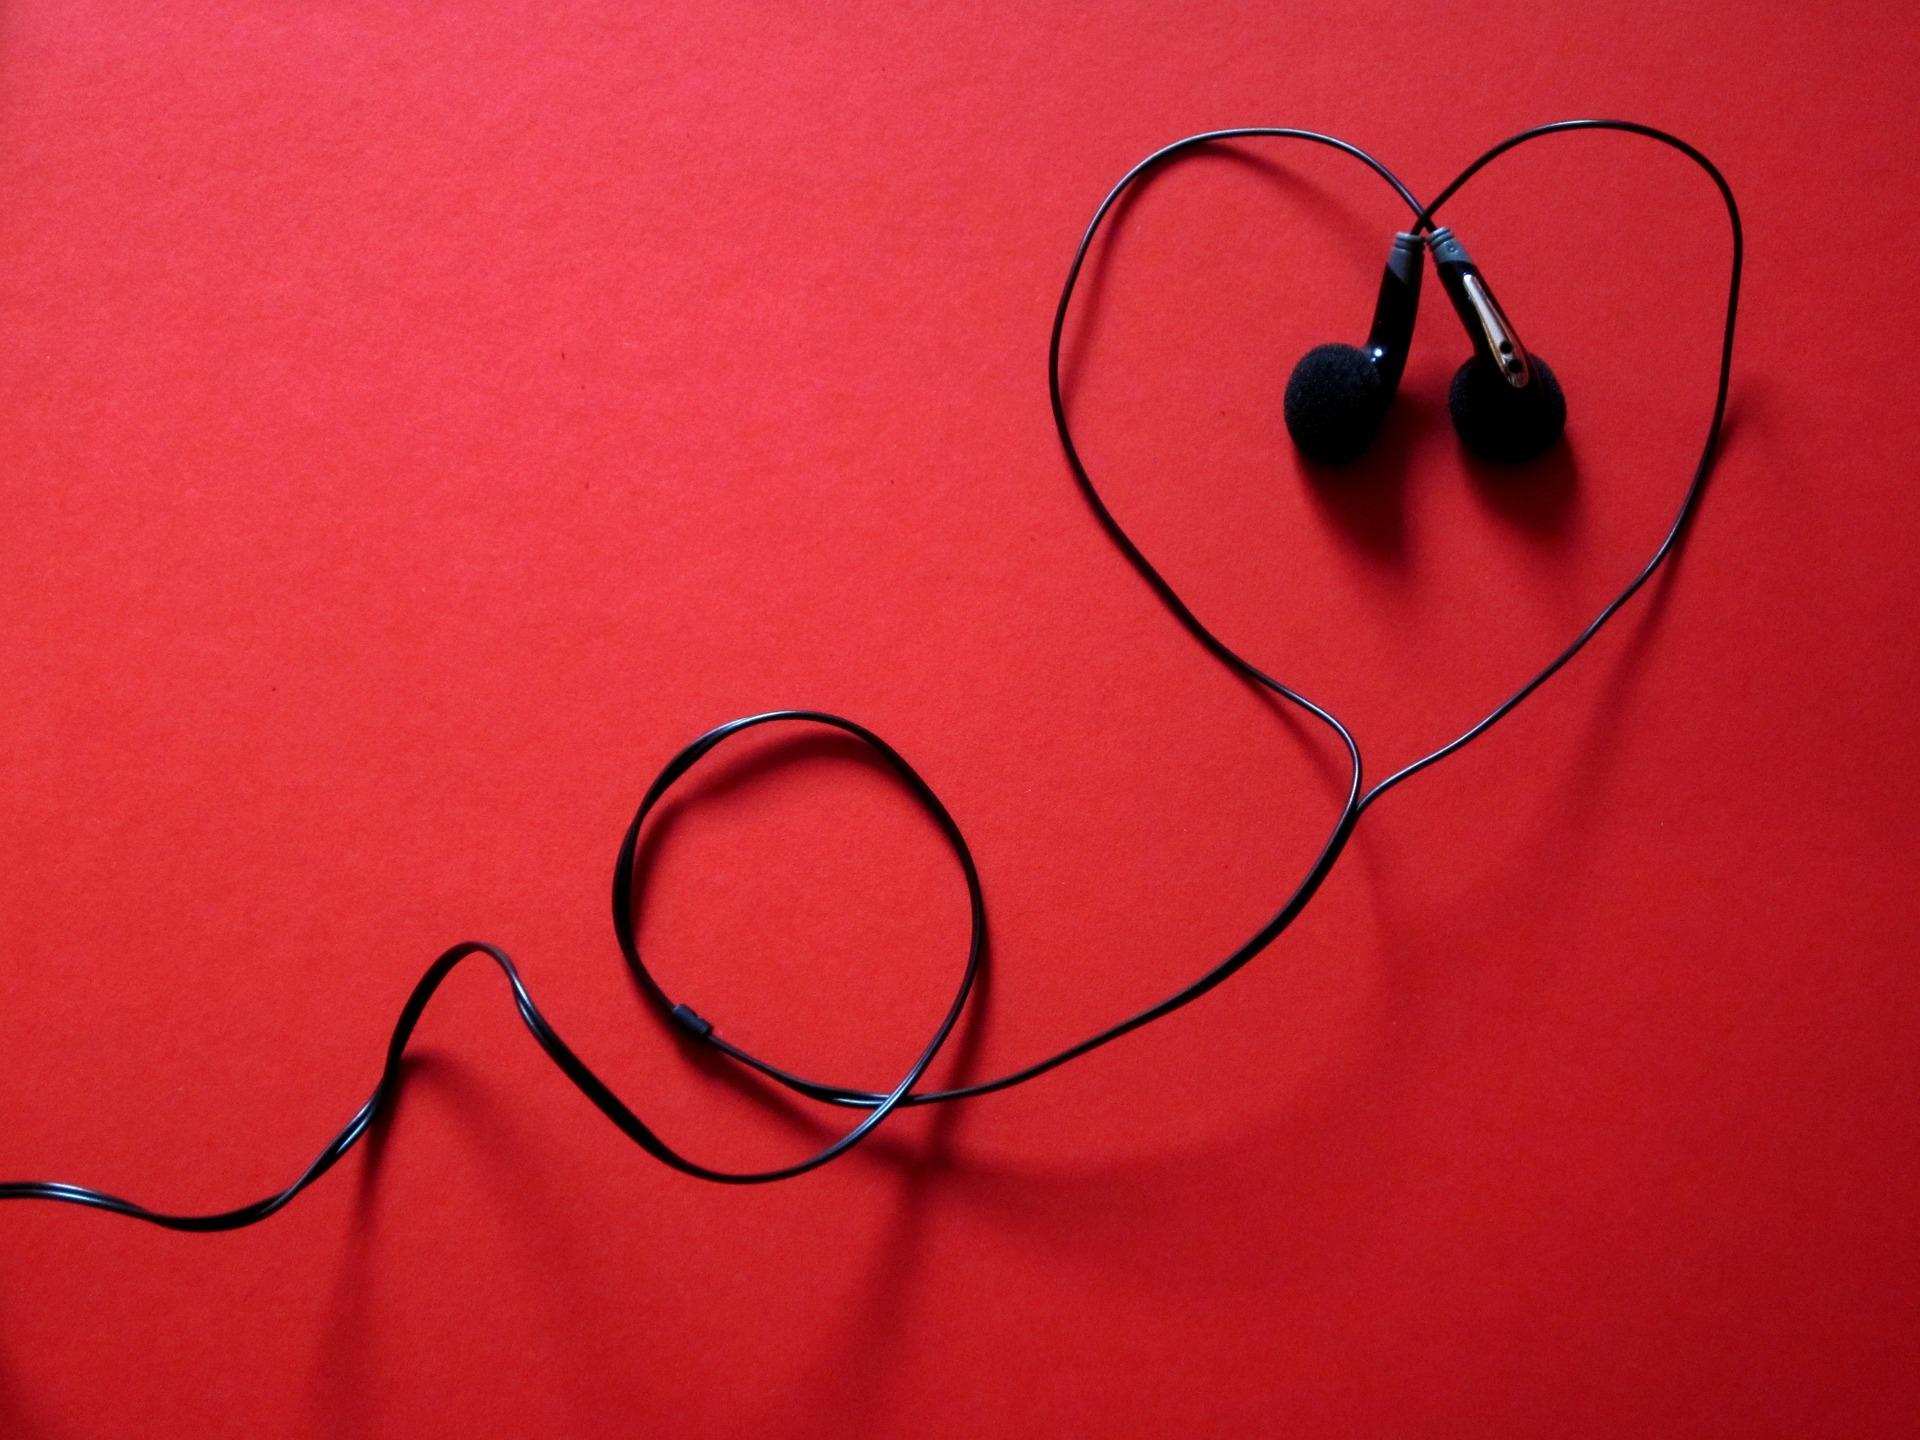 headphones-424163_1920 (1)